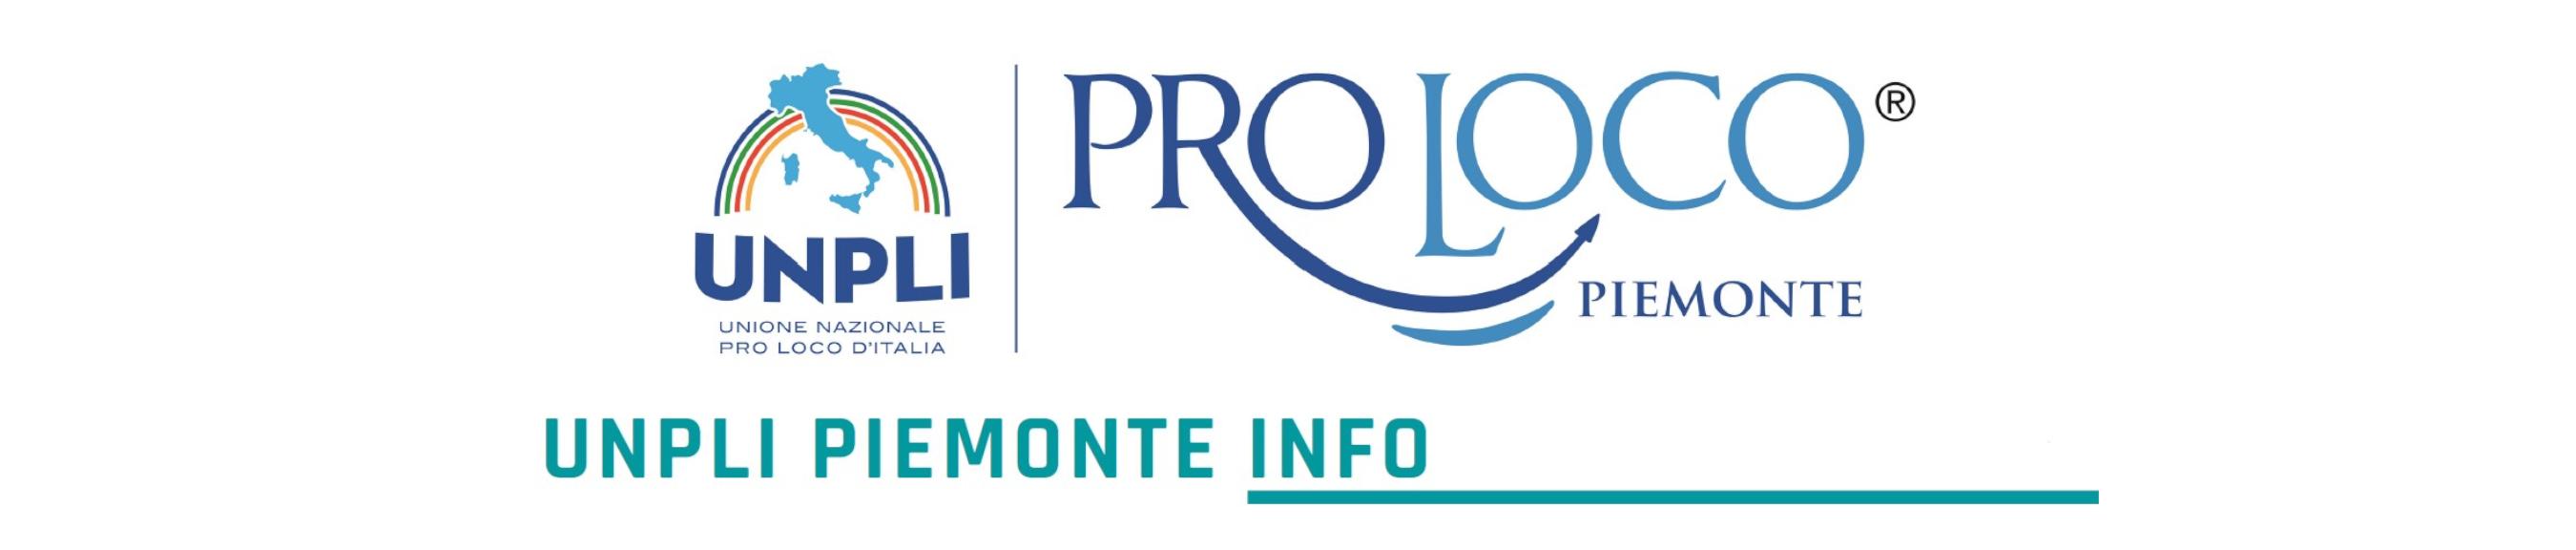 Biella: convocata assemblea provinciale